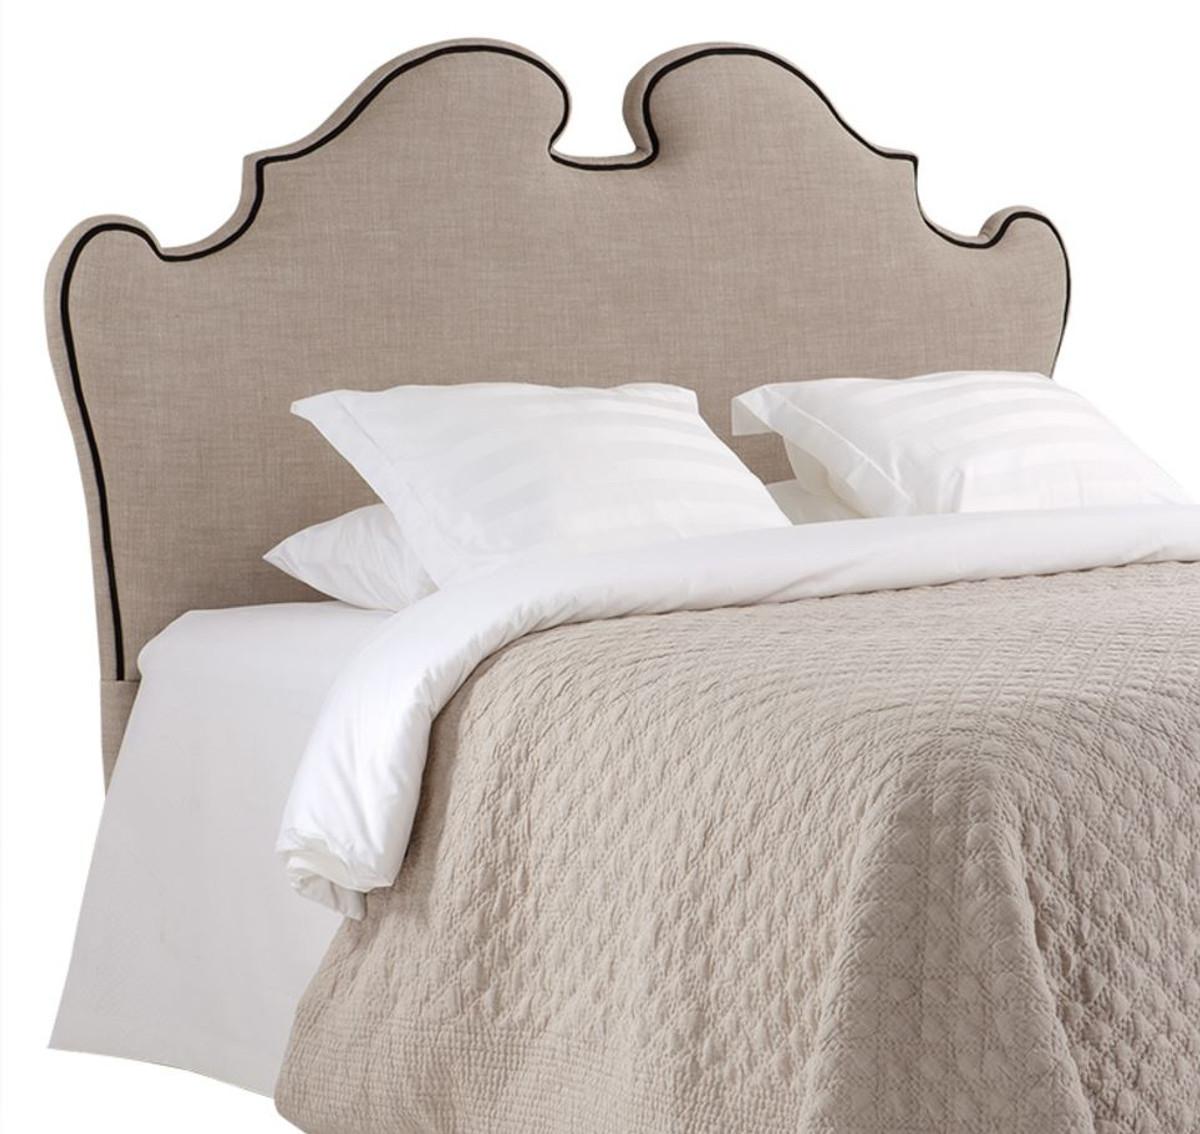 casa padrino designer bett kopfteil beige 200 x h 144 cm luxus qualit t betten. Black Bedroom Furniture Sets. Home Design Ideas